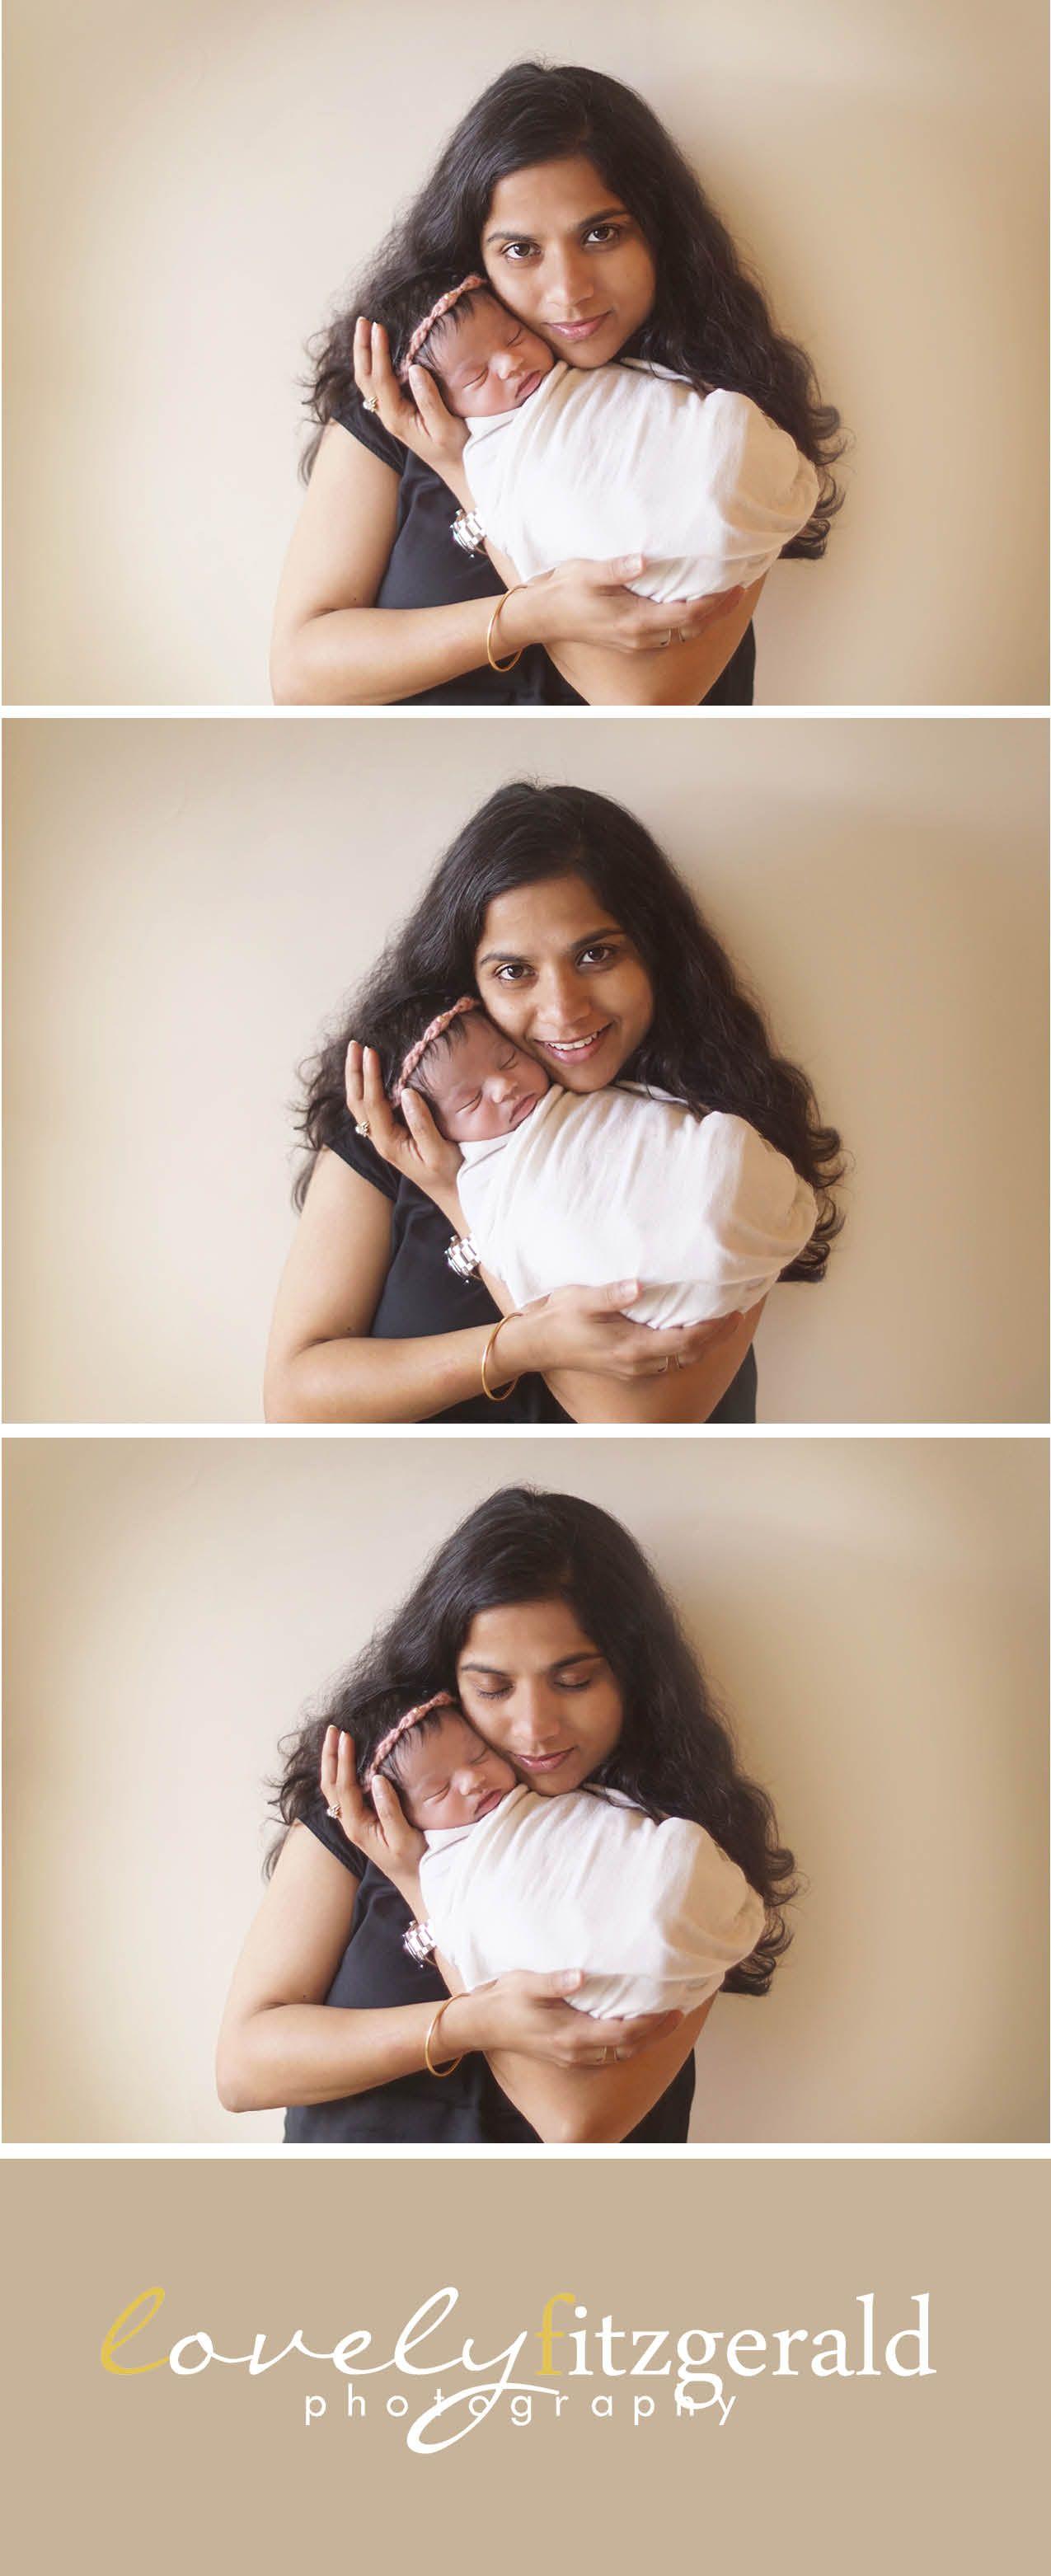 Dallas Newborn Photographer   Lovely Fitzgerald Photography LLC #newbornpose #newbornmentor #newbornworkshop #motherpose